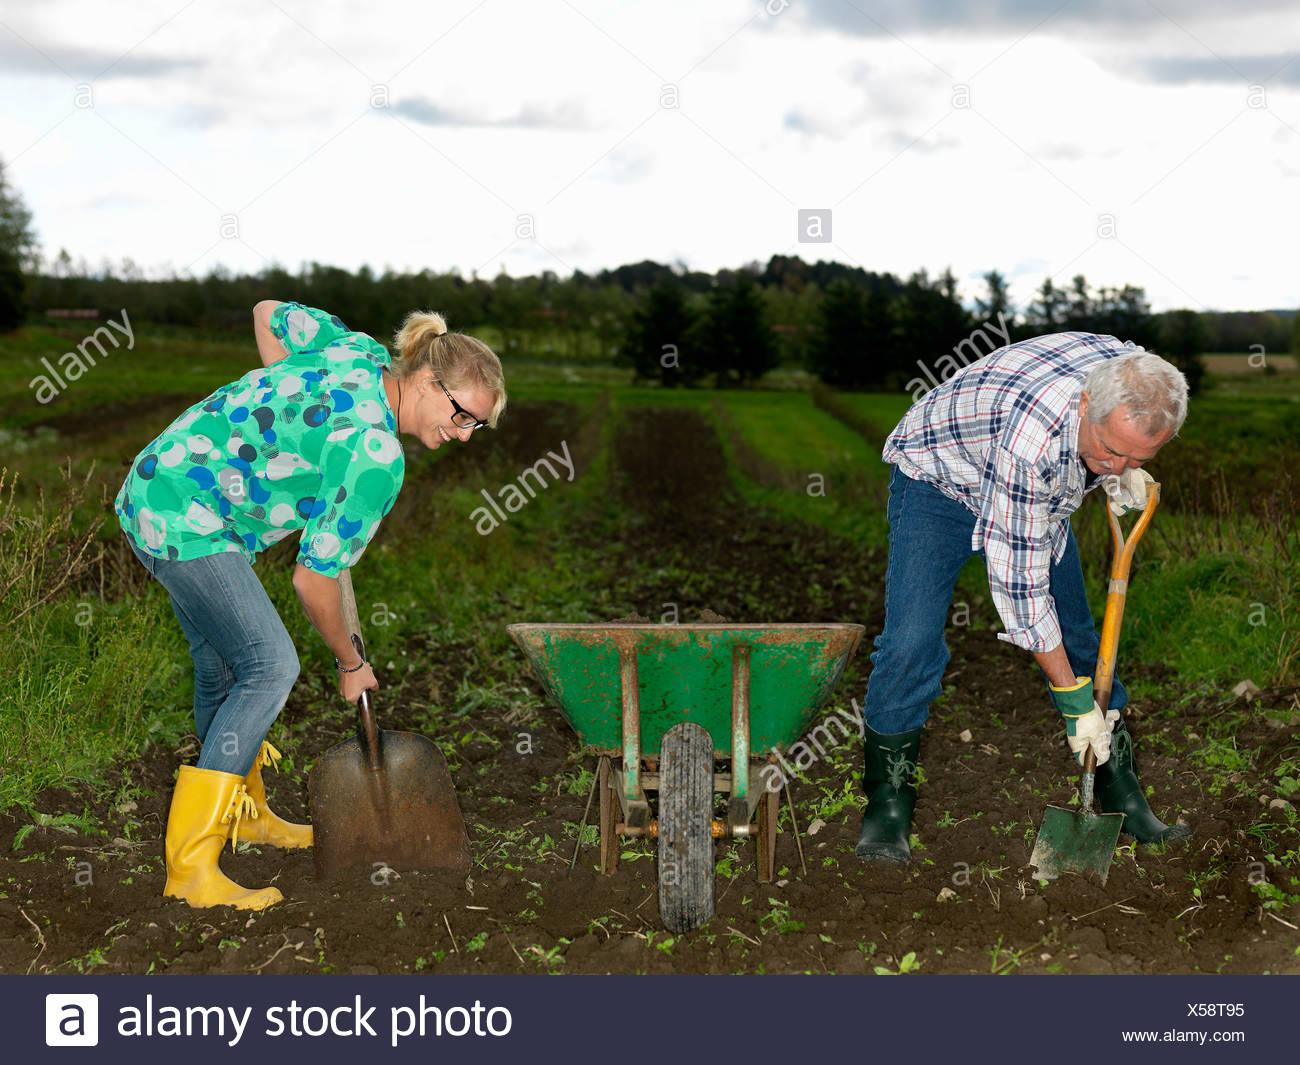 Man and woman shoveling dirt Stock Photo